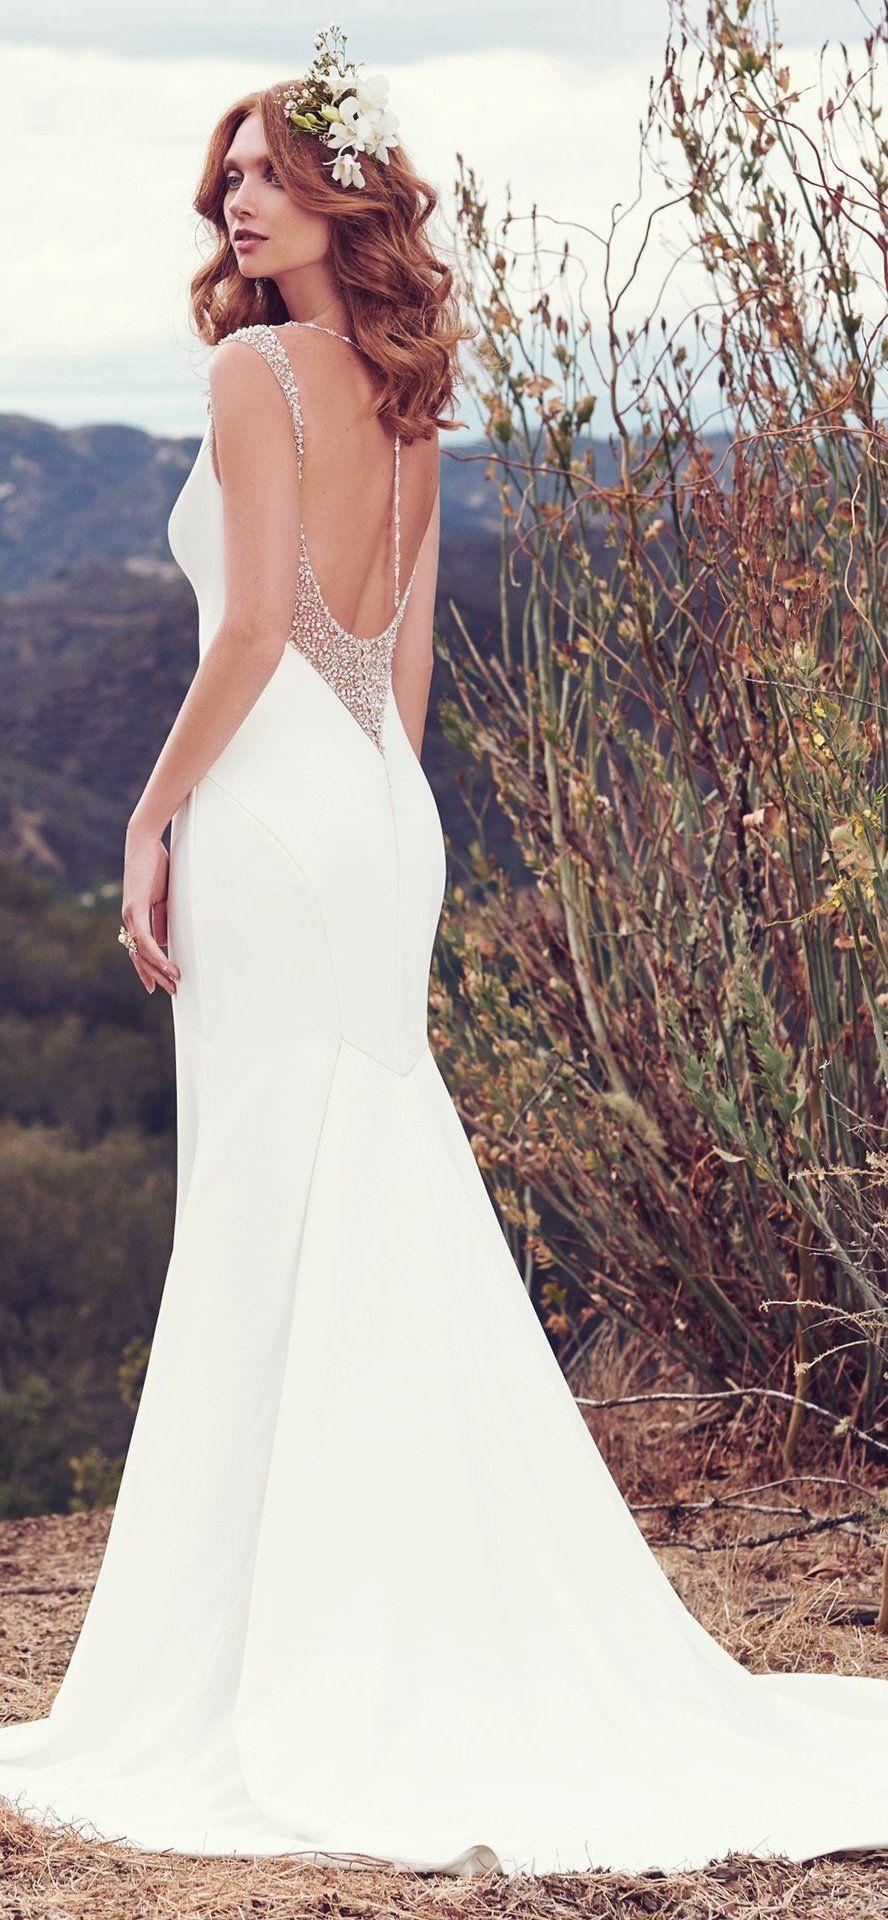 Evangelina By Maggie Sottero Wedding Dresses And Accessories Glamourous Wedding Dress Wedding Dresses Maggie Sottero Wedding Dresses [ 1920 x 888 Pixel ]